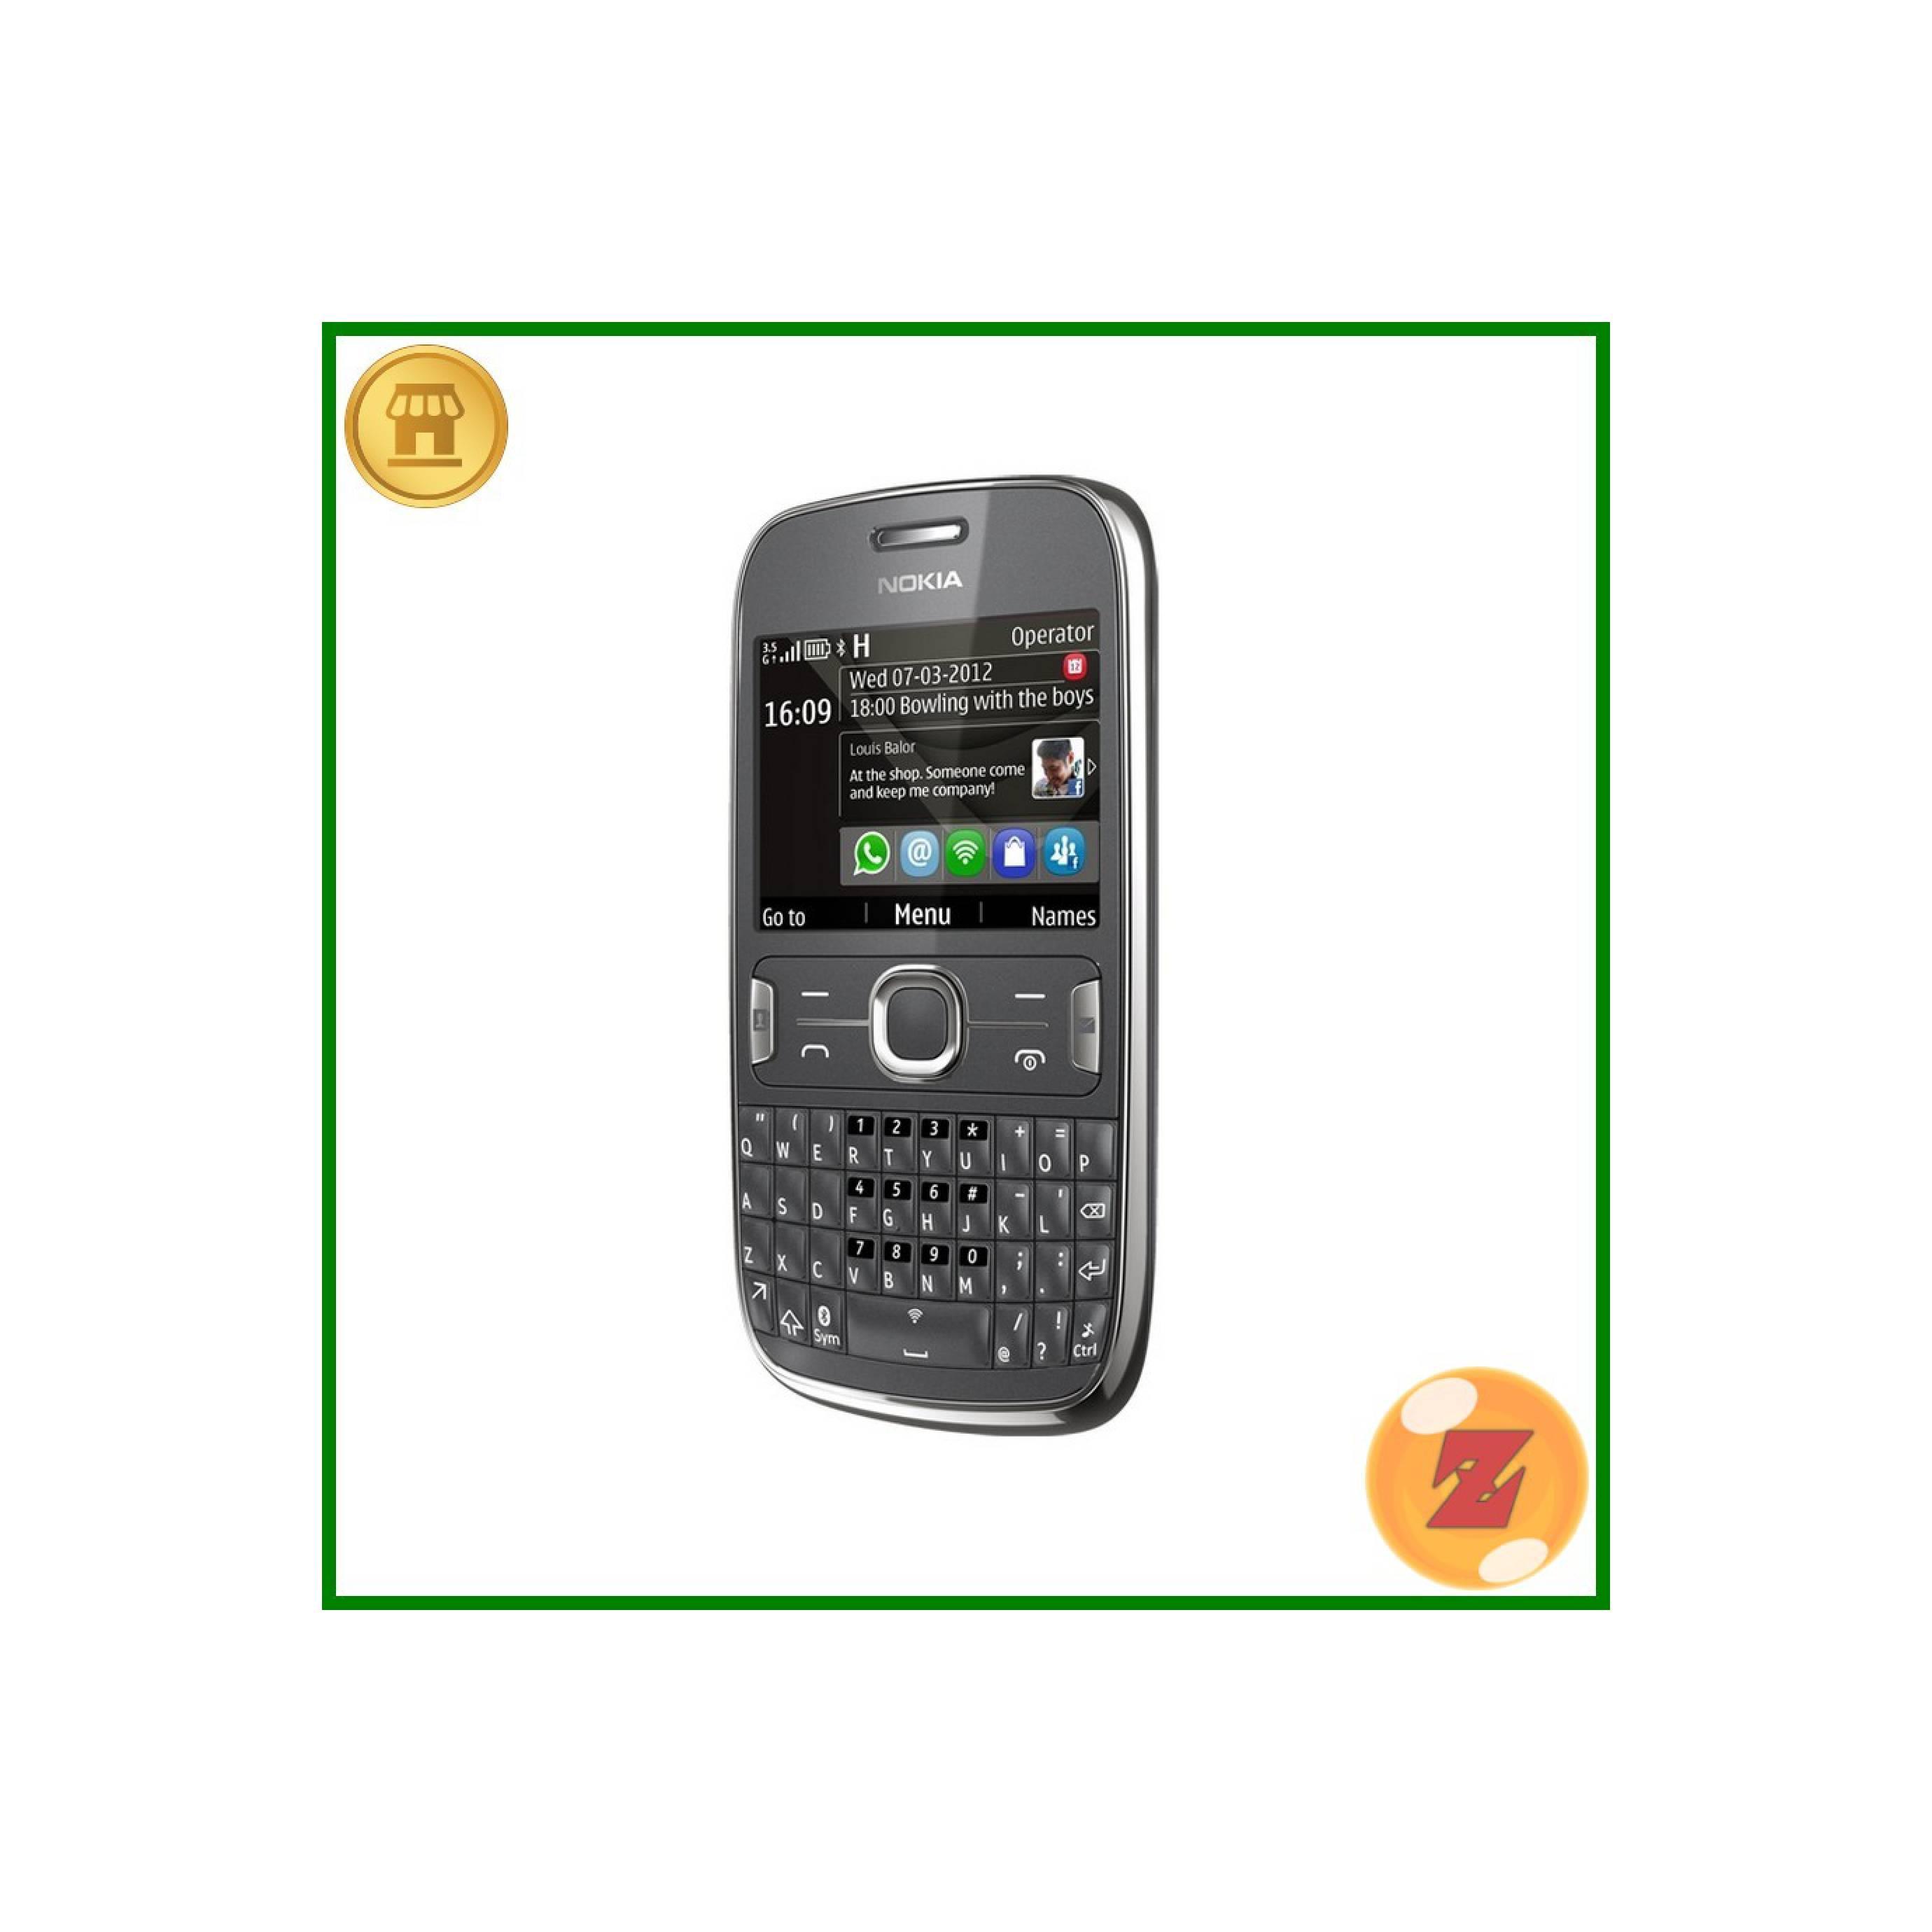 Nokia Asha 201 Hitam - HP Jadul Murah - Nokia Jadul Paling Dicari